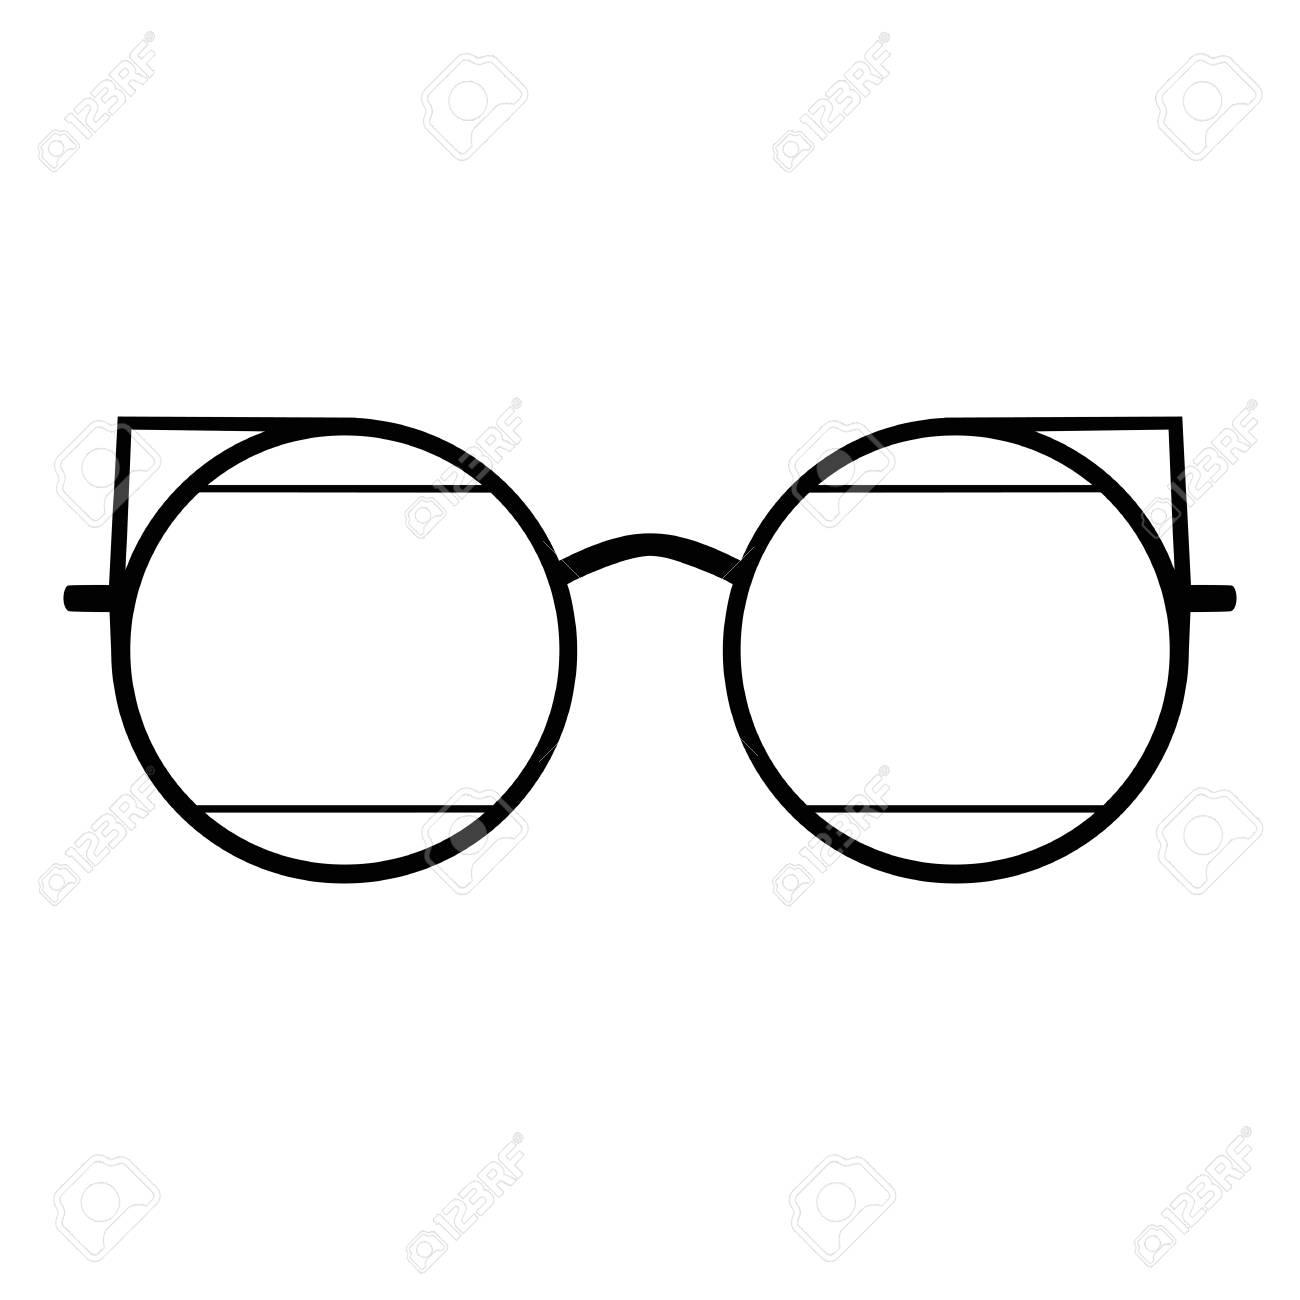 Retro Glasses Web Ui Sunglasses Black Silhouettes Eye Glasses Royalty Free Cliparts Vectors And Stock Illustration Image 126999398